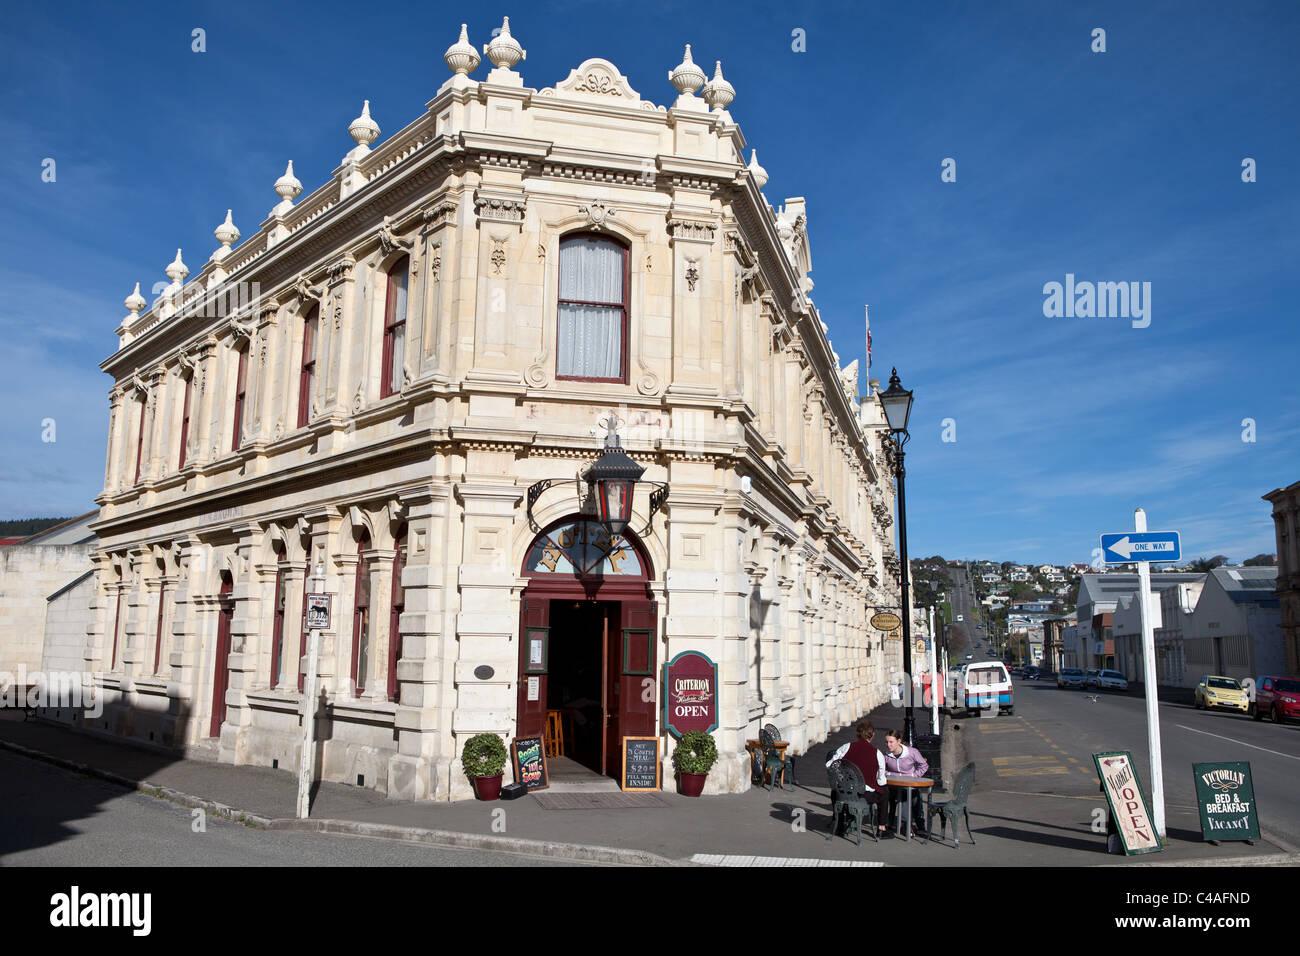 Historic Criterion Hotel, Oamaru, New Zealand - Stock Image